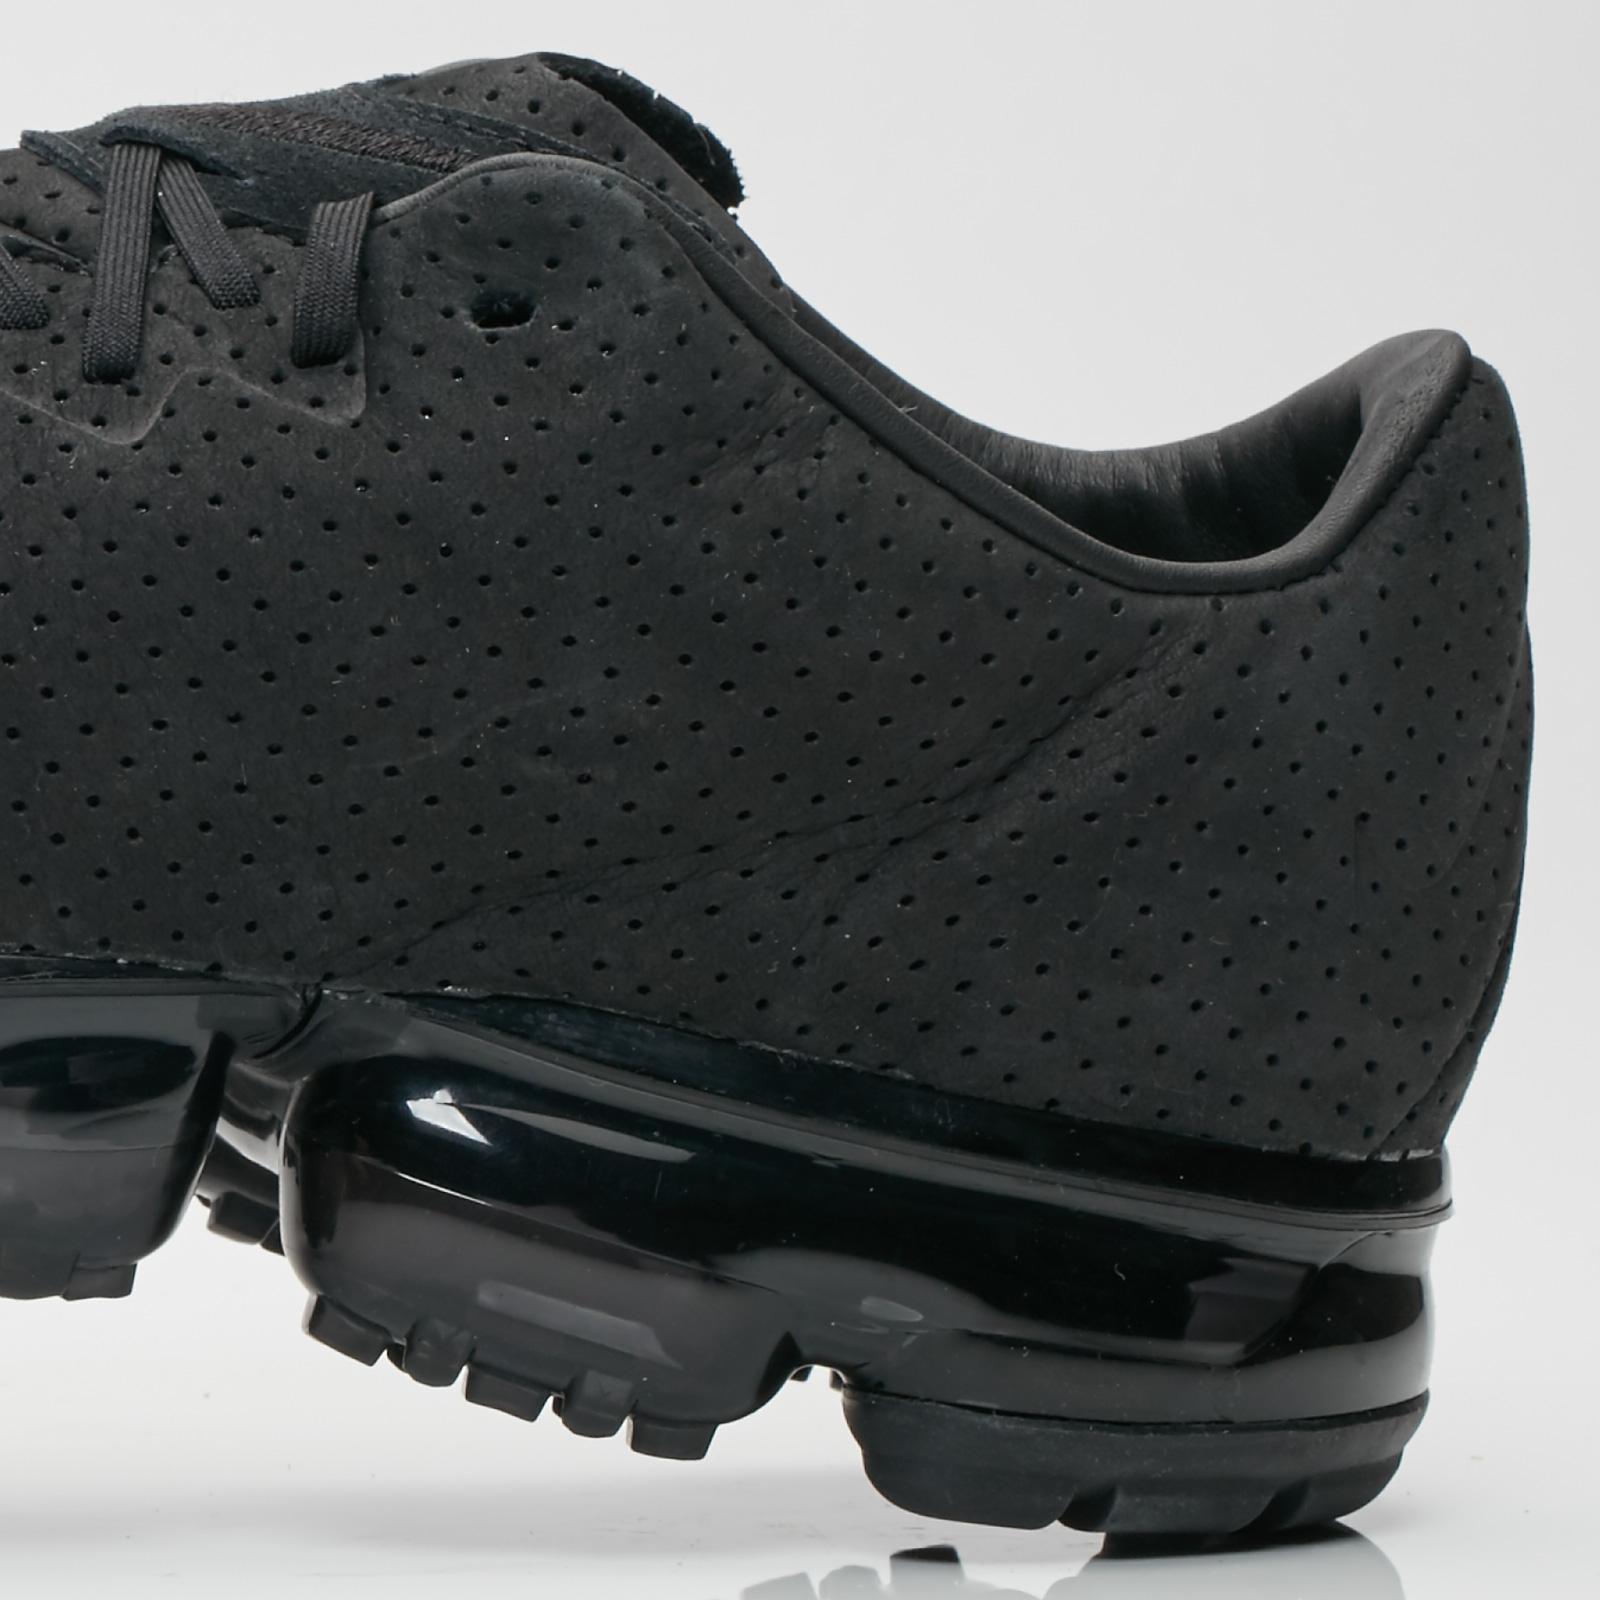 75a88c64d0d83 Nike Air Vapormax LTR - Aj8287-001 - Sneakersnstuff